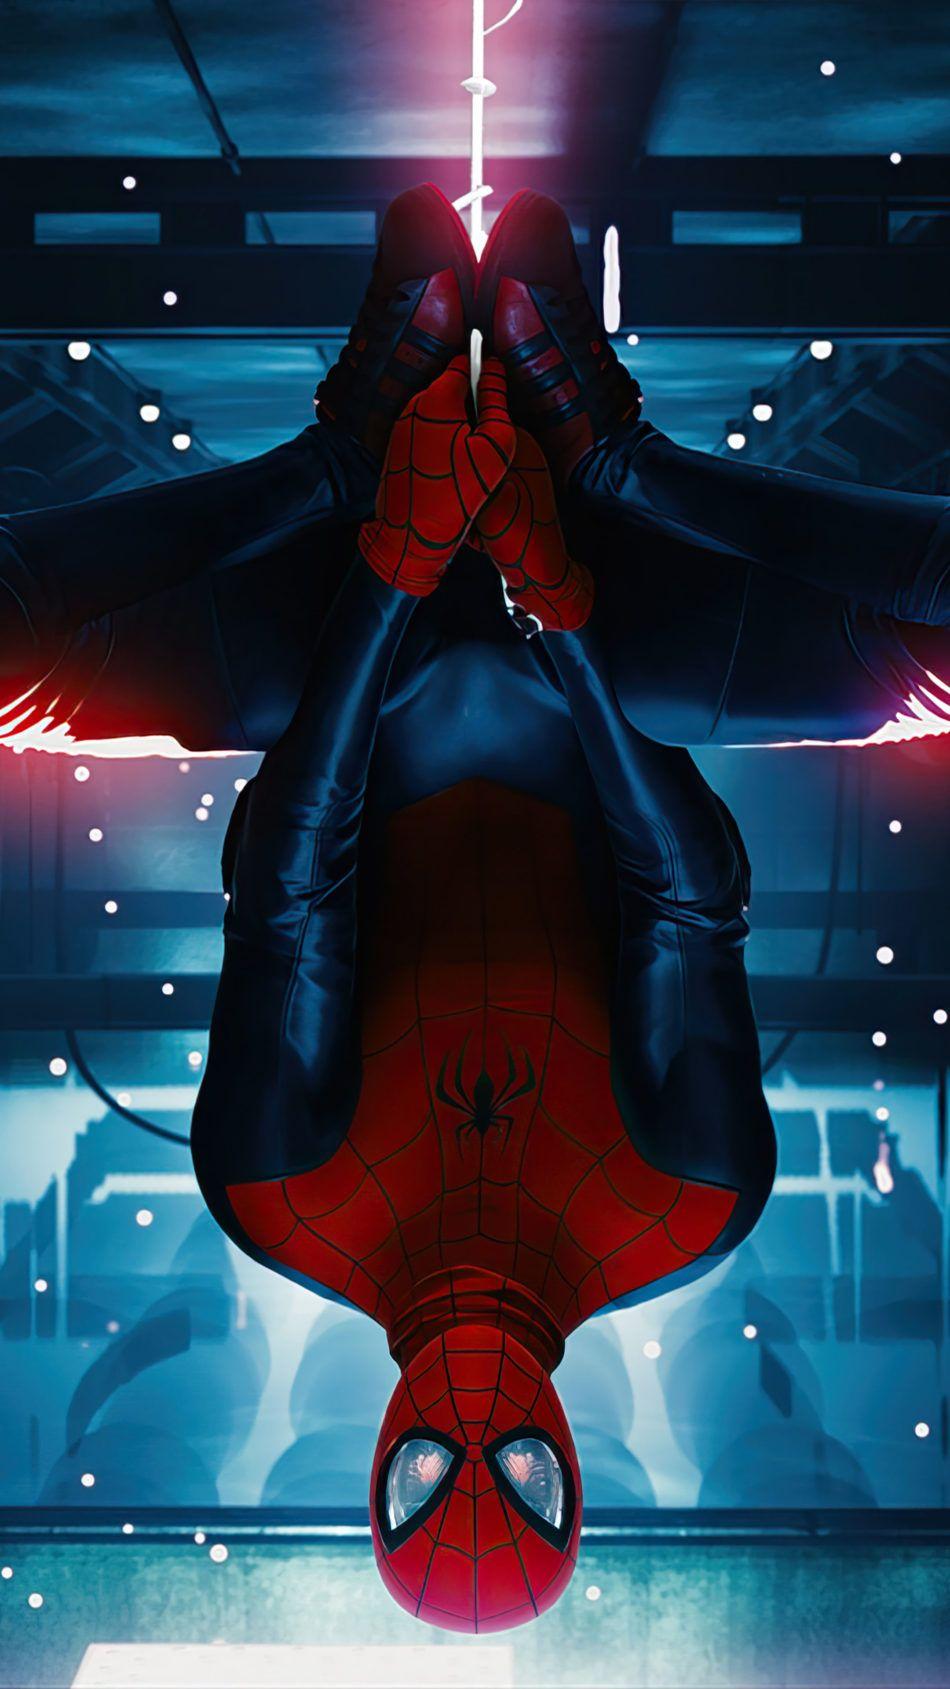 Spider Man Miles Morales Hanging Upside Down 4k Ultra Hd Mobile Wallpaper Spiderman Spiderman Upside Down Spiderman Comic